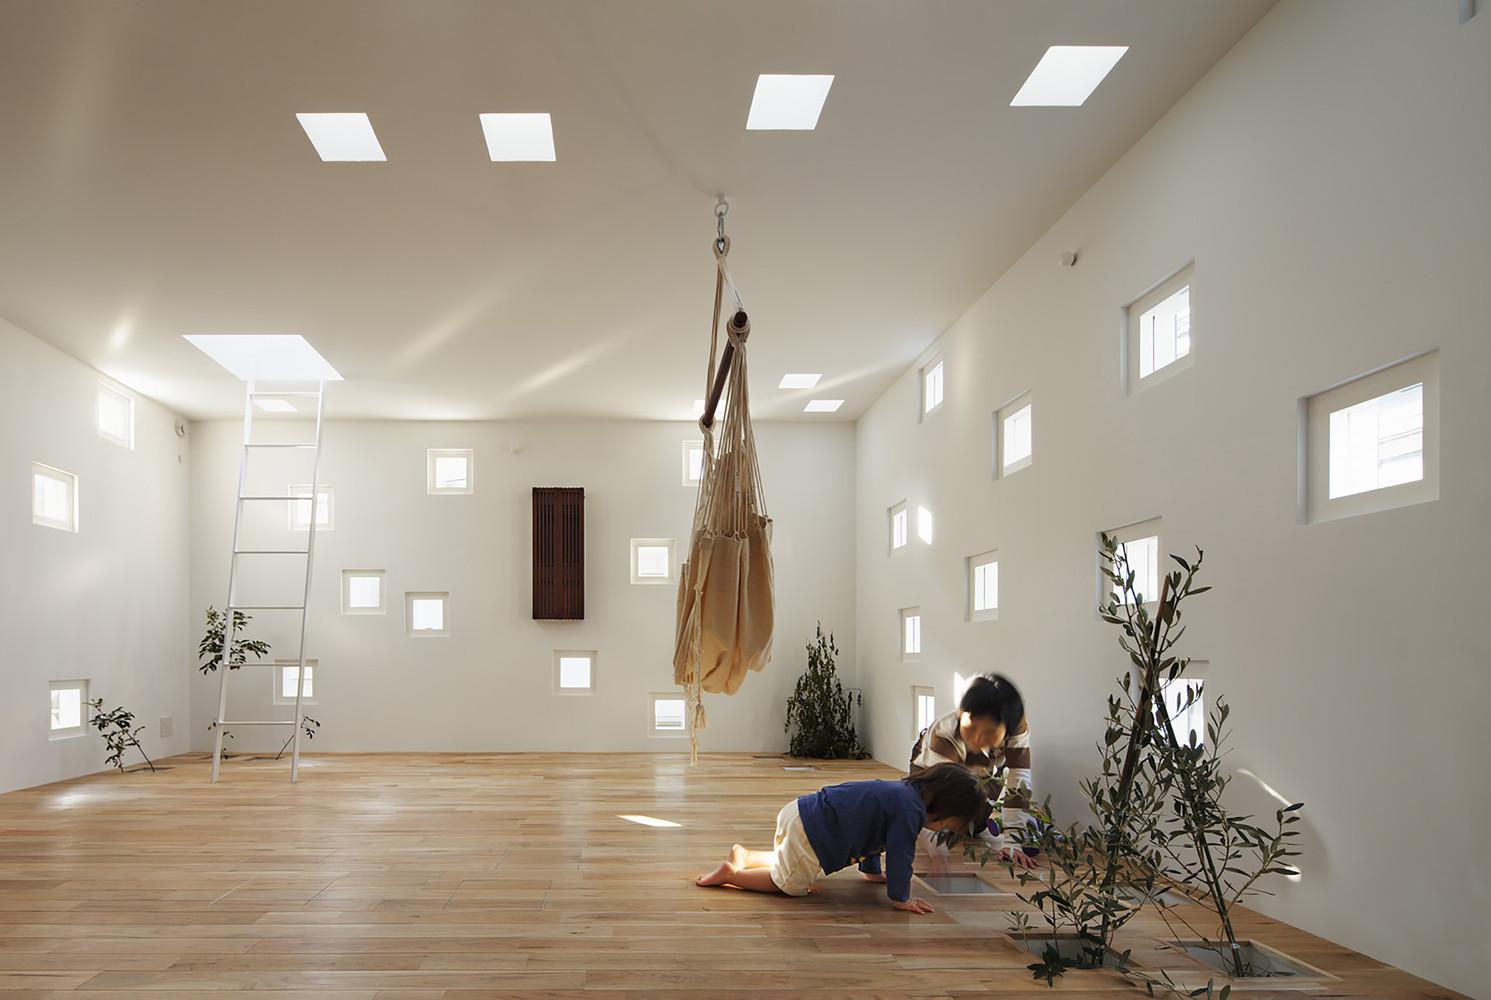 cửa sổ trên sàn